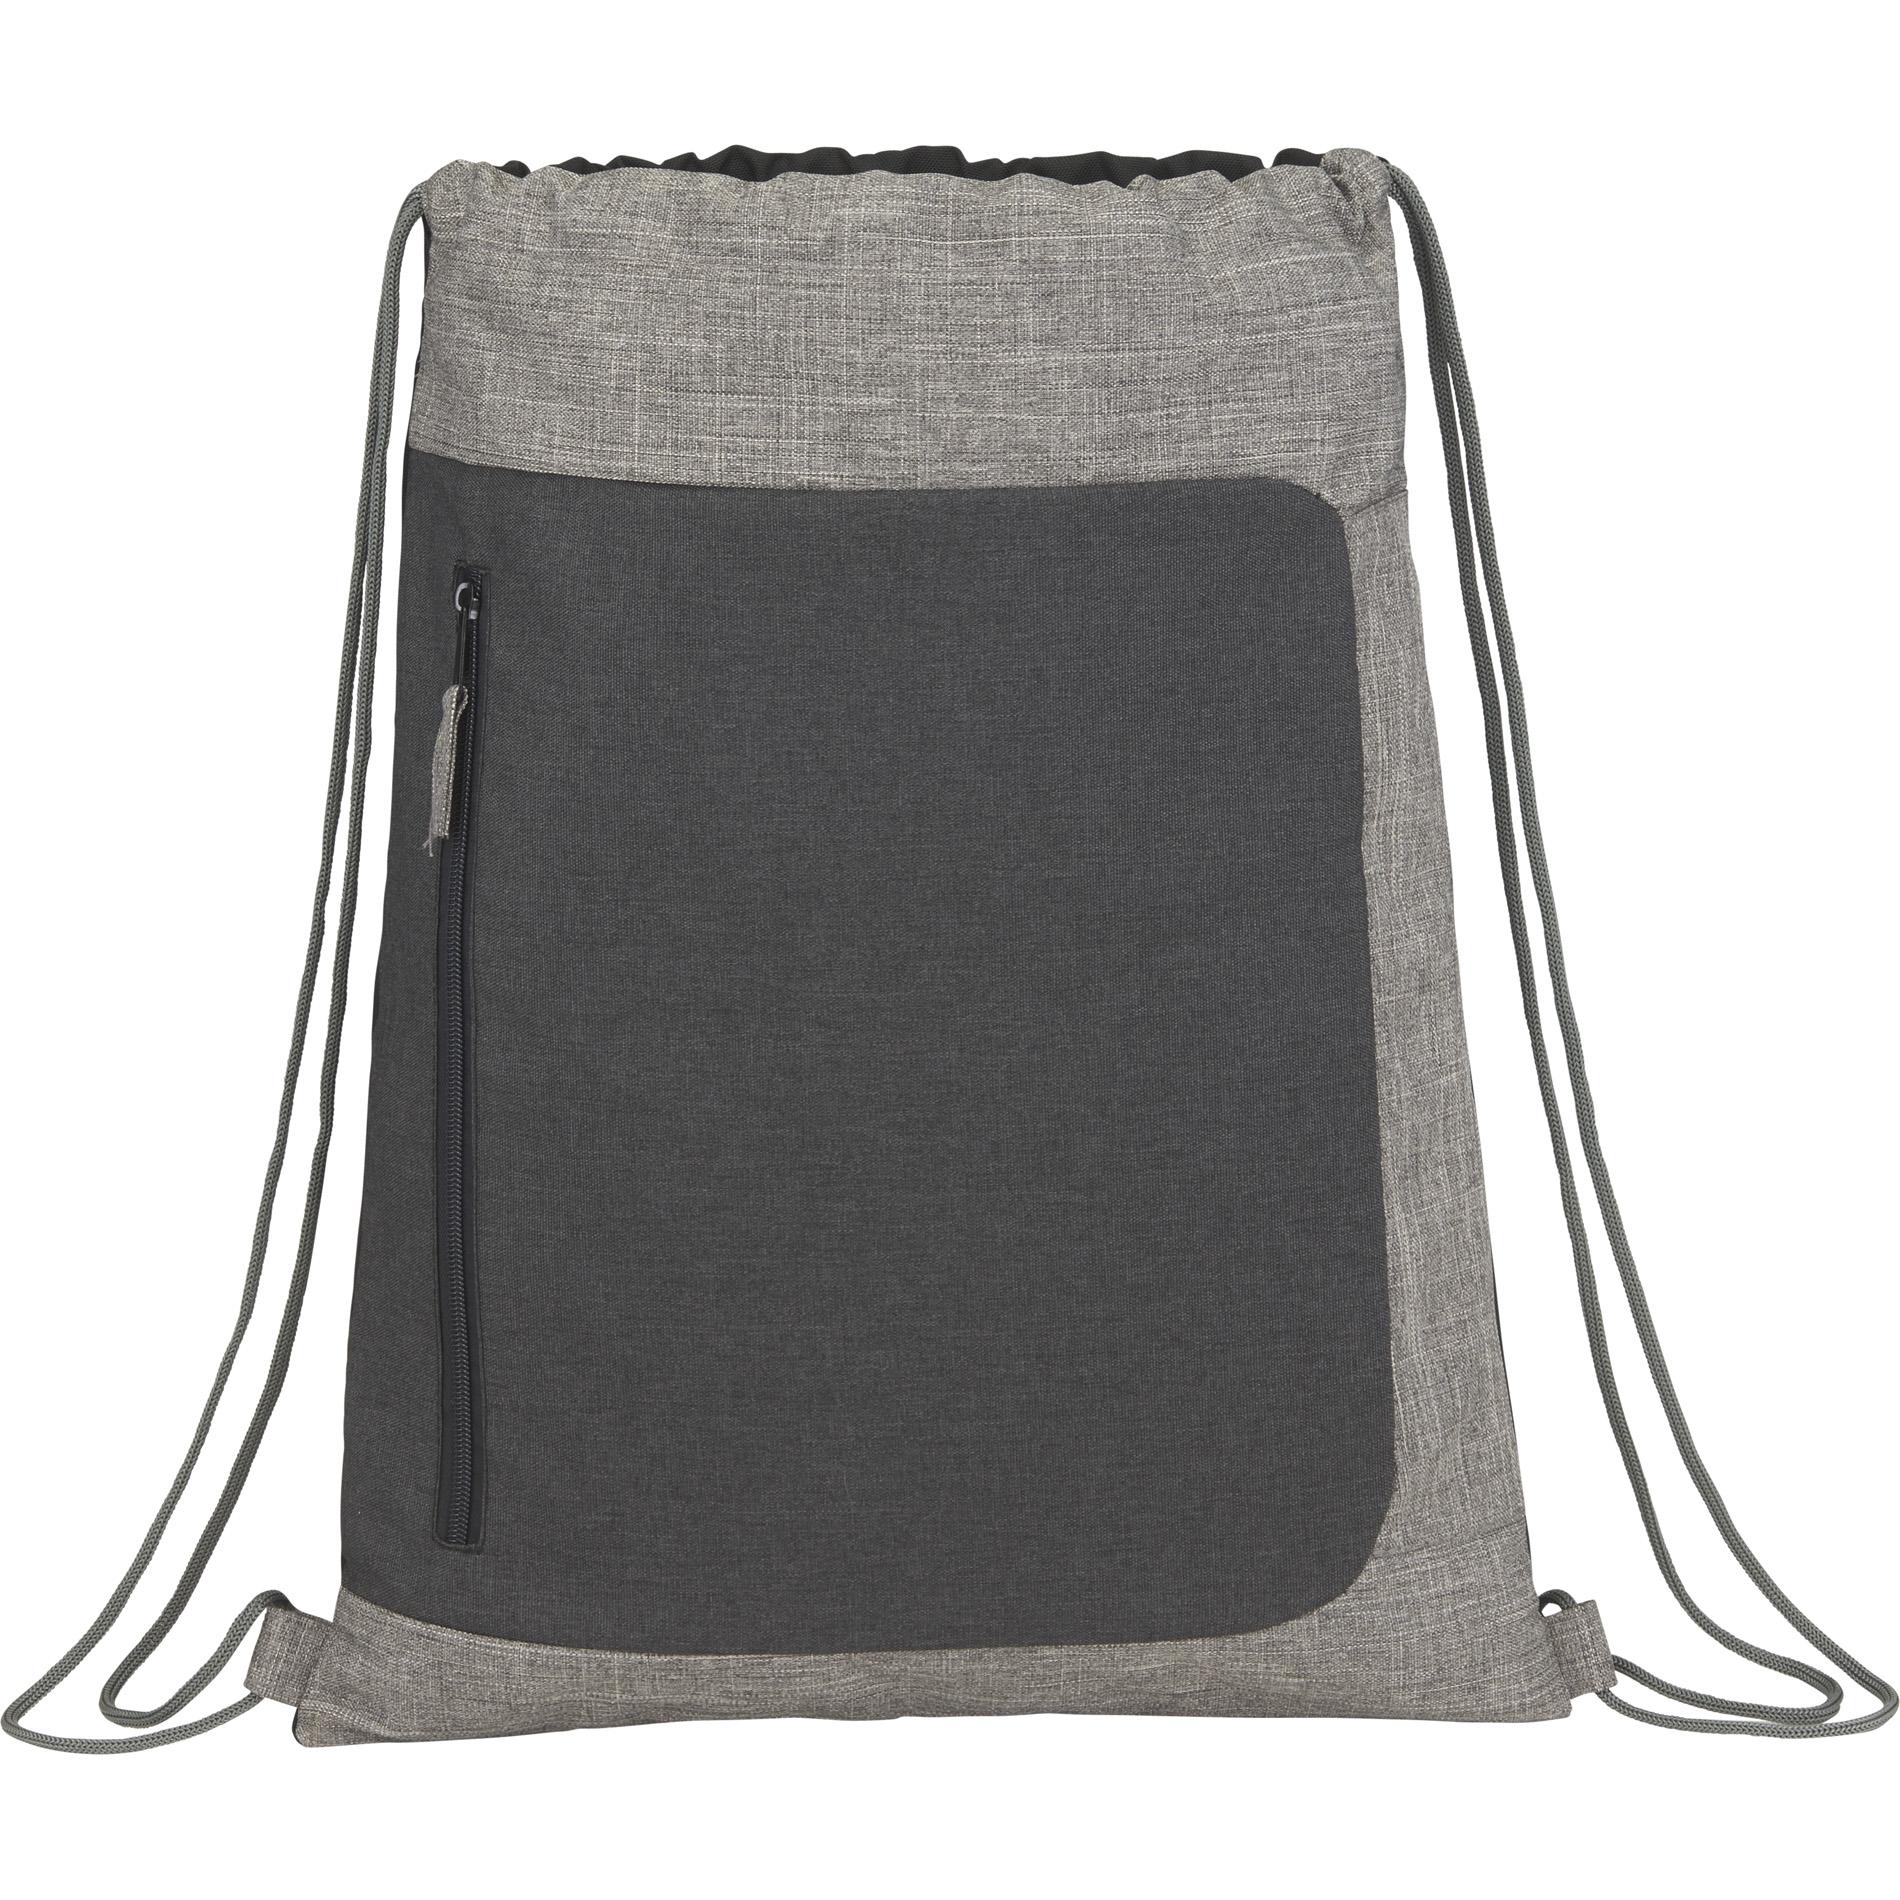 LEEDS 3001-71 - Reclaim Recycled Drawstring Bag